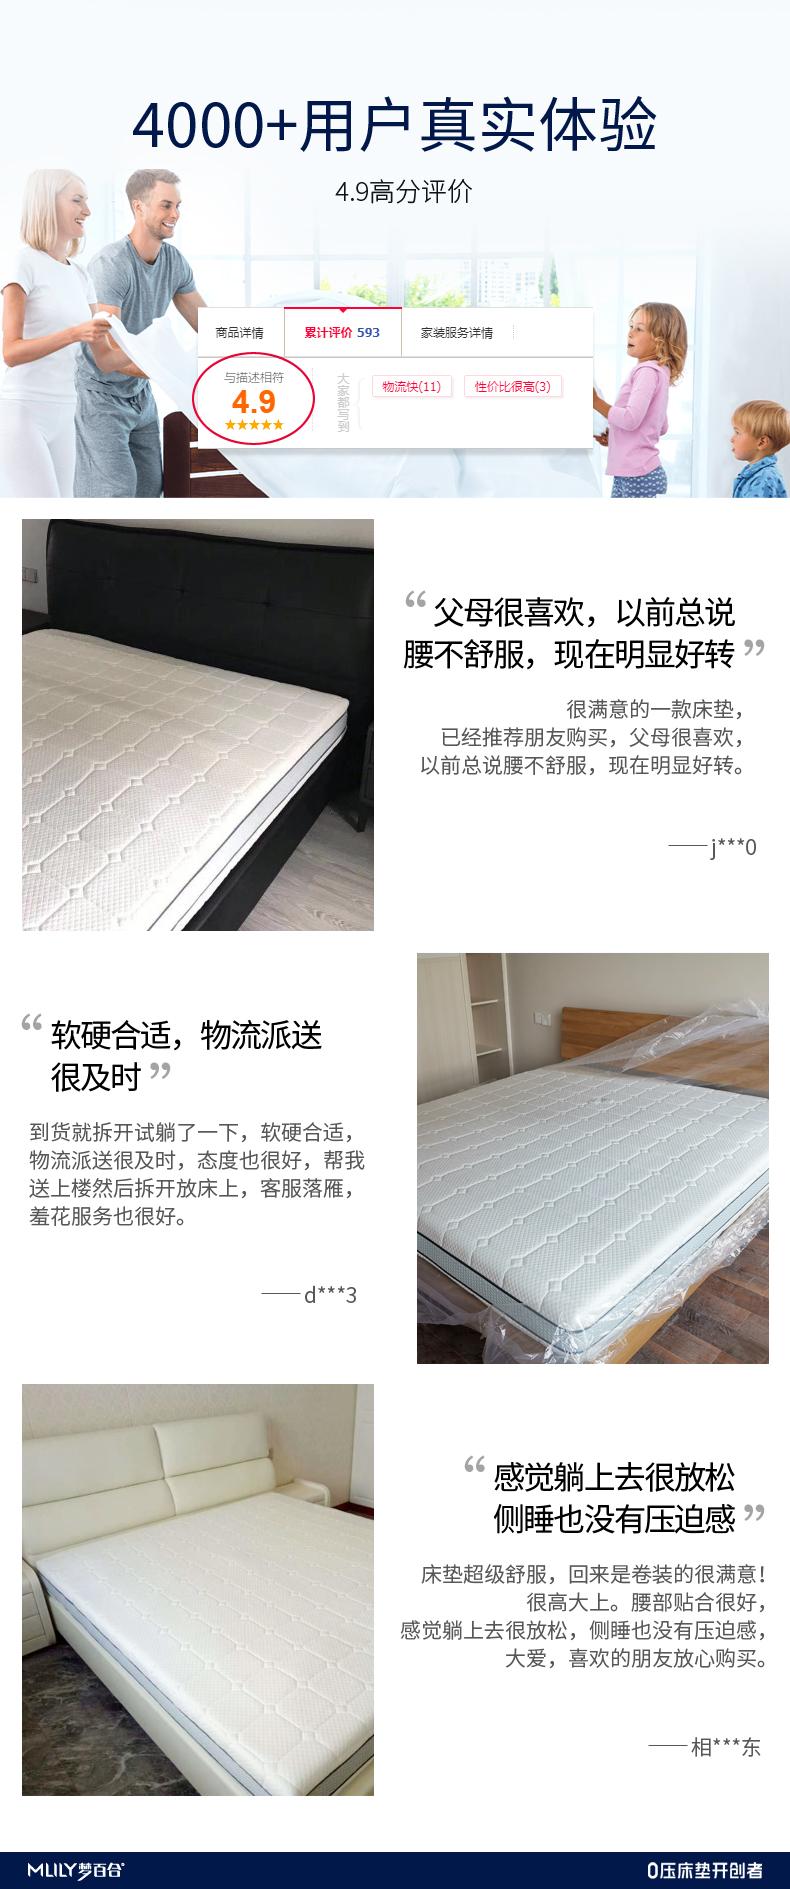 Mlily梦百合床垫朗怡0压厚垫独立弹簧静音记忆绵护脊床垫两面可用朗怡0压床垫1800*2000